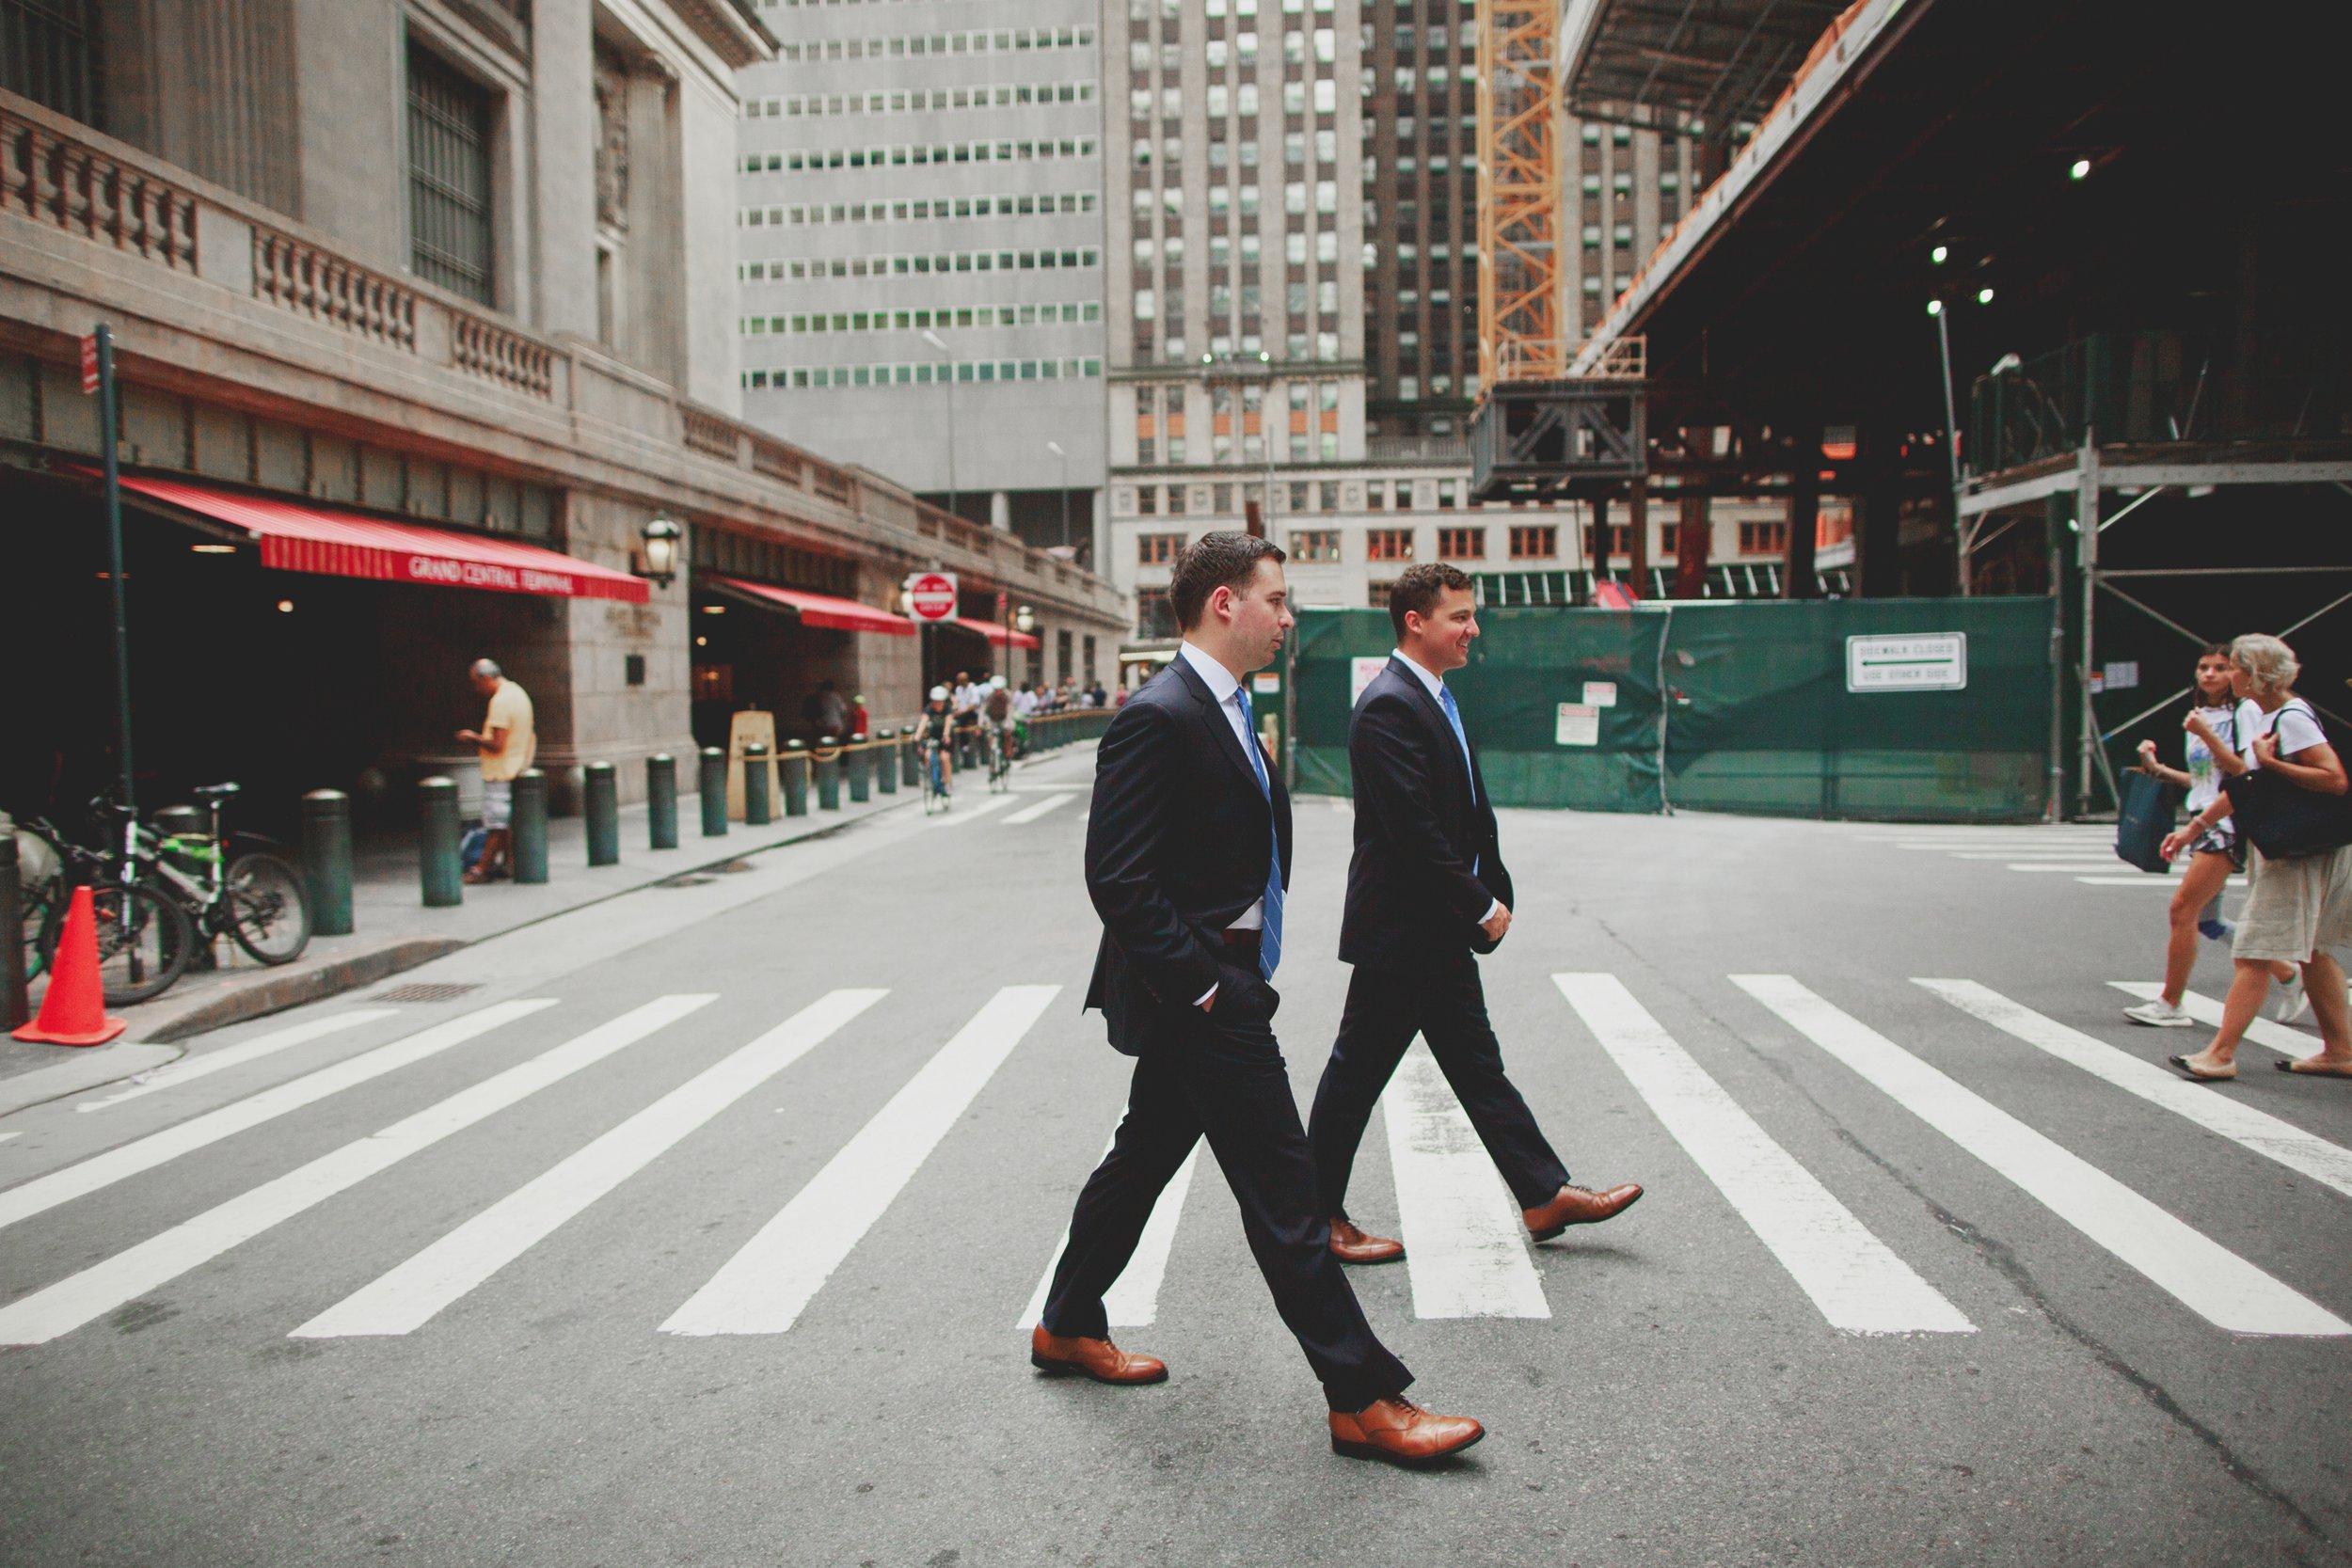 amanda_vanvels_new_york_lgbtq_gay_wedding_039.jpg